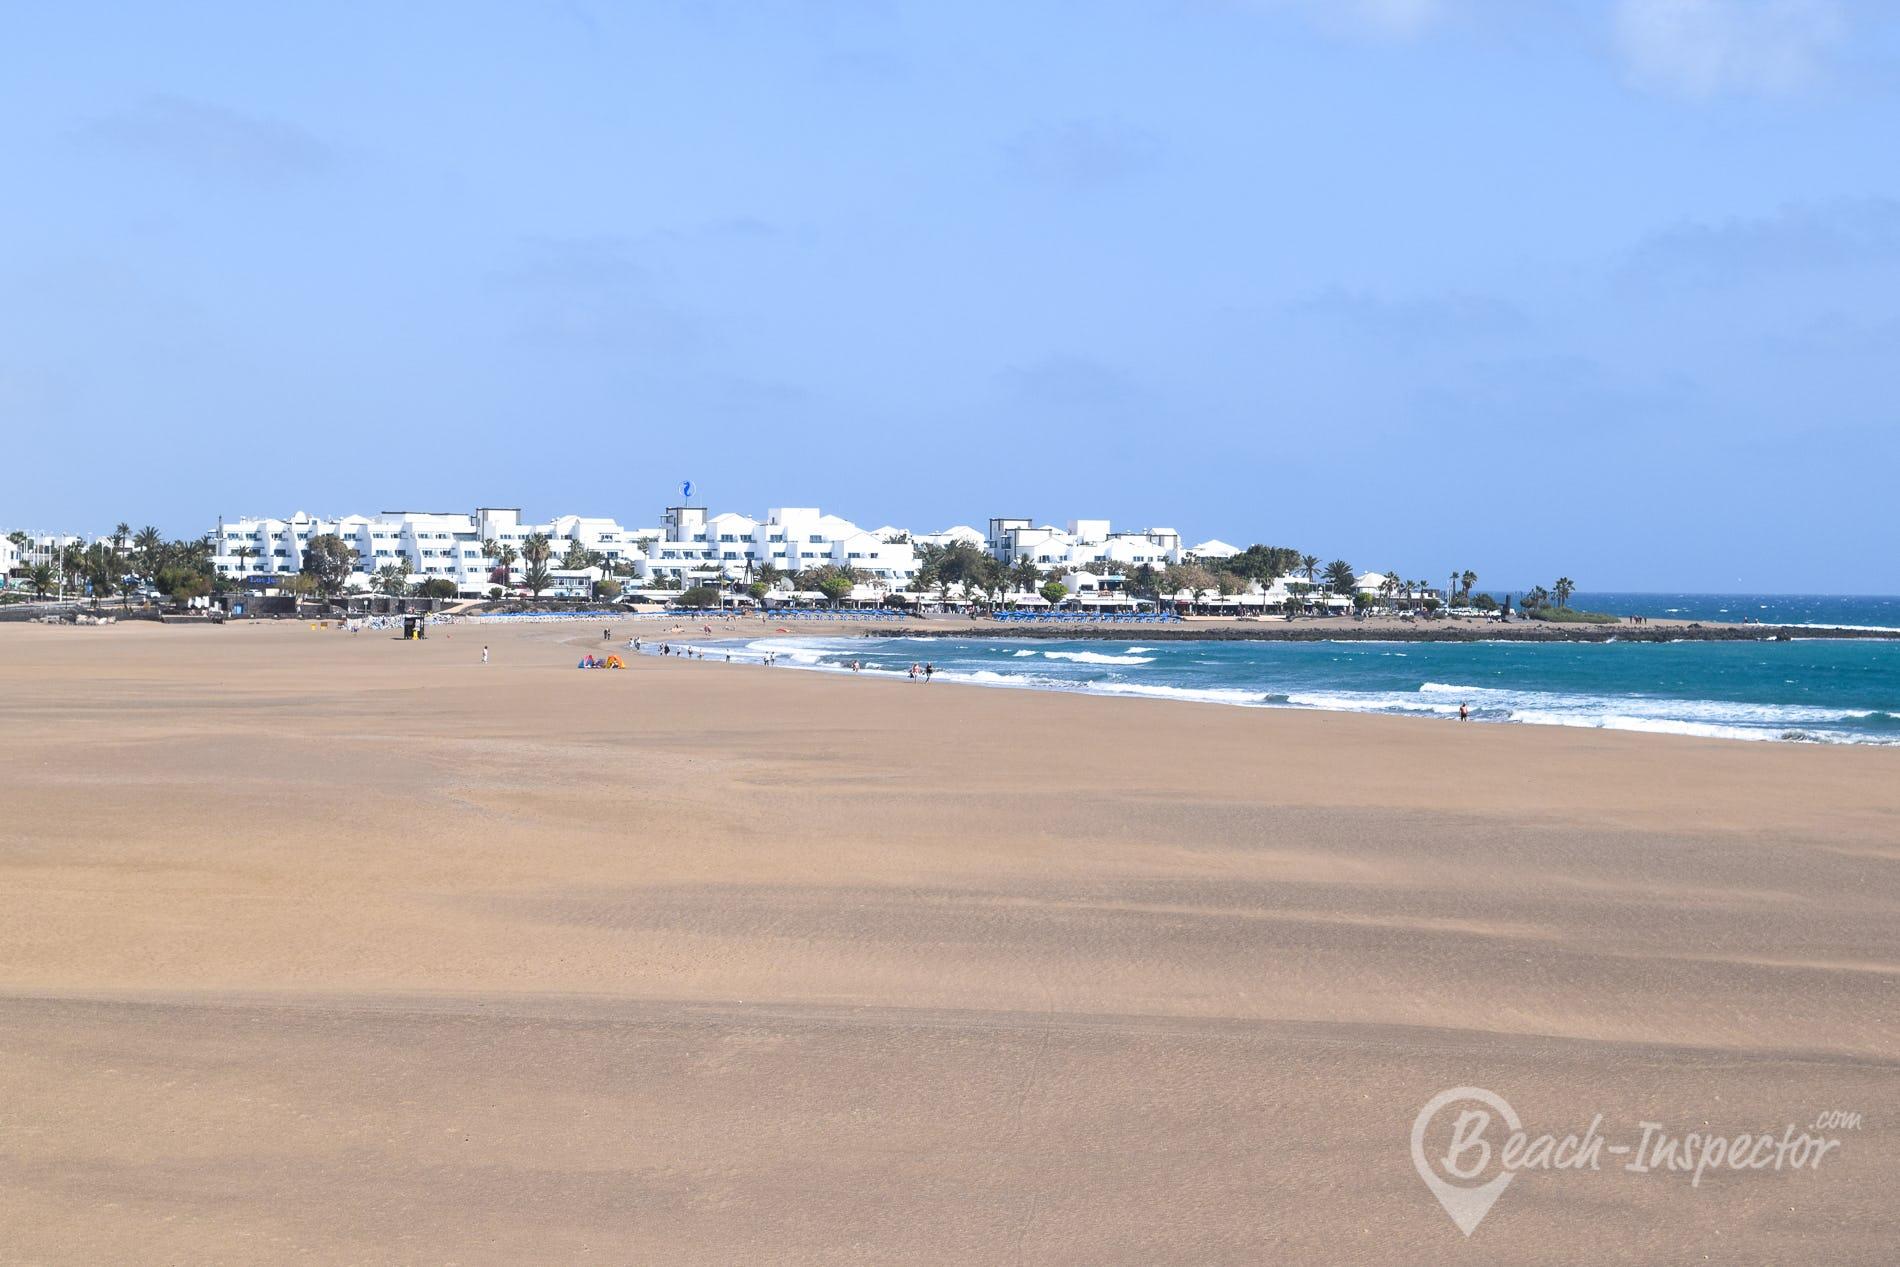 Die Besten Hotels In Lanzarote